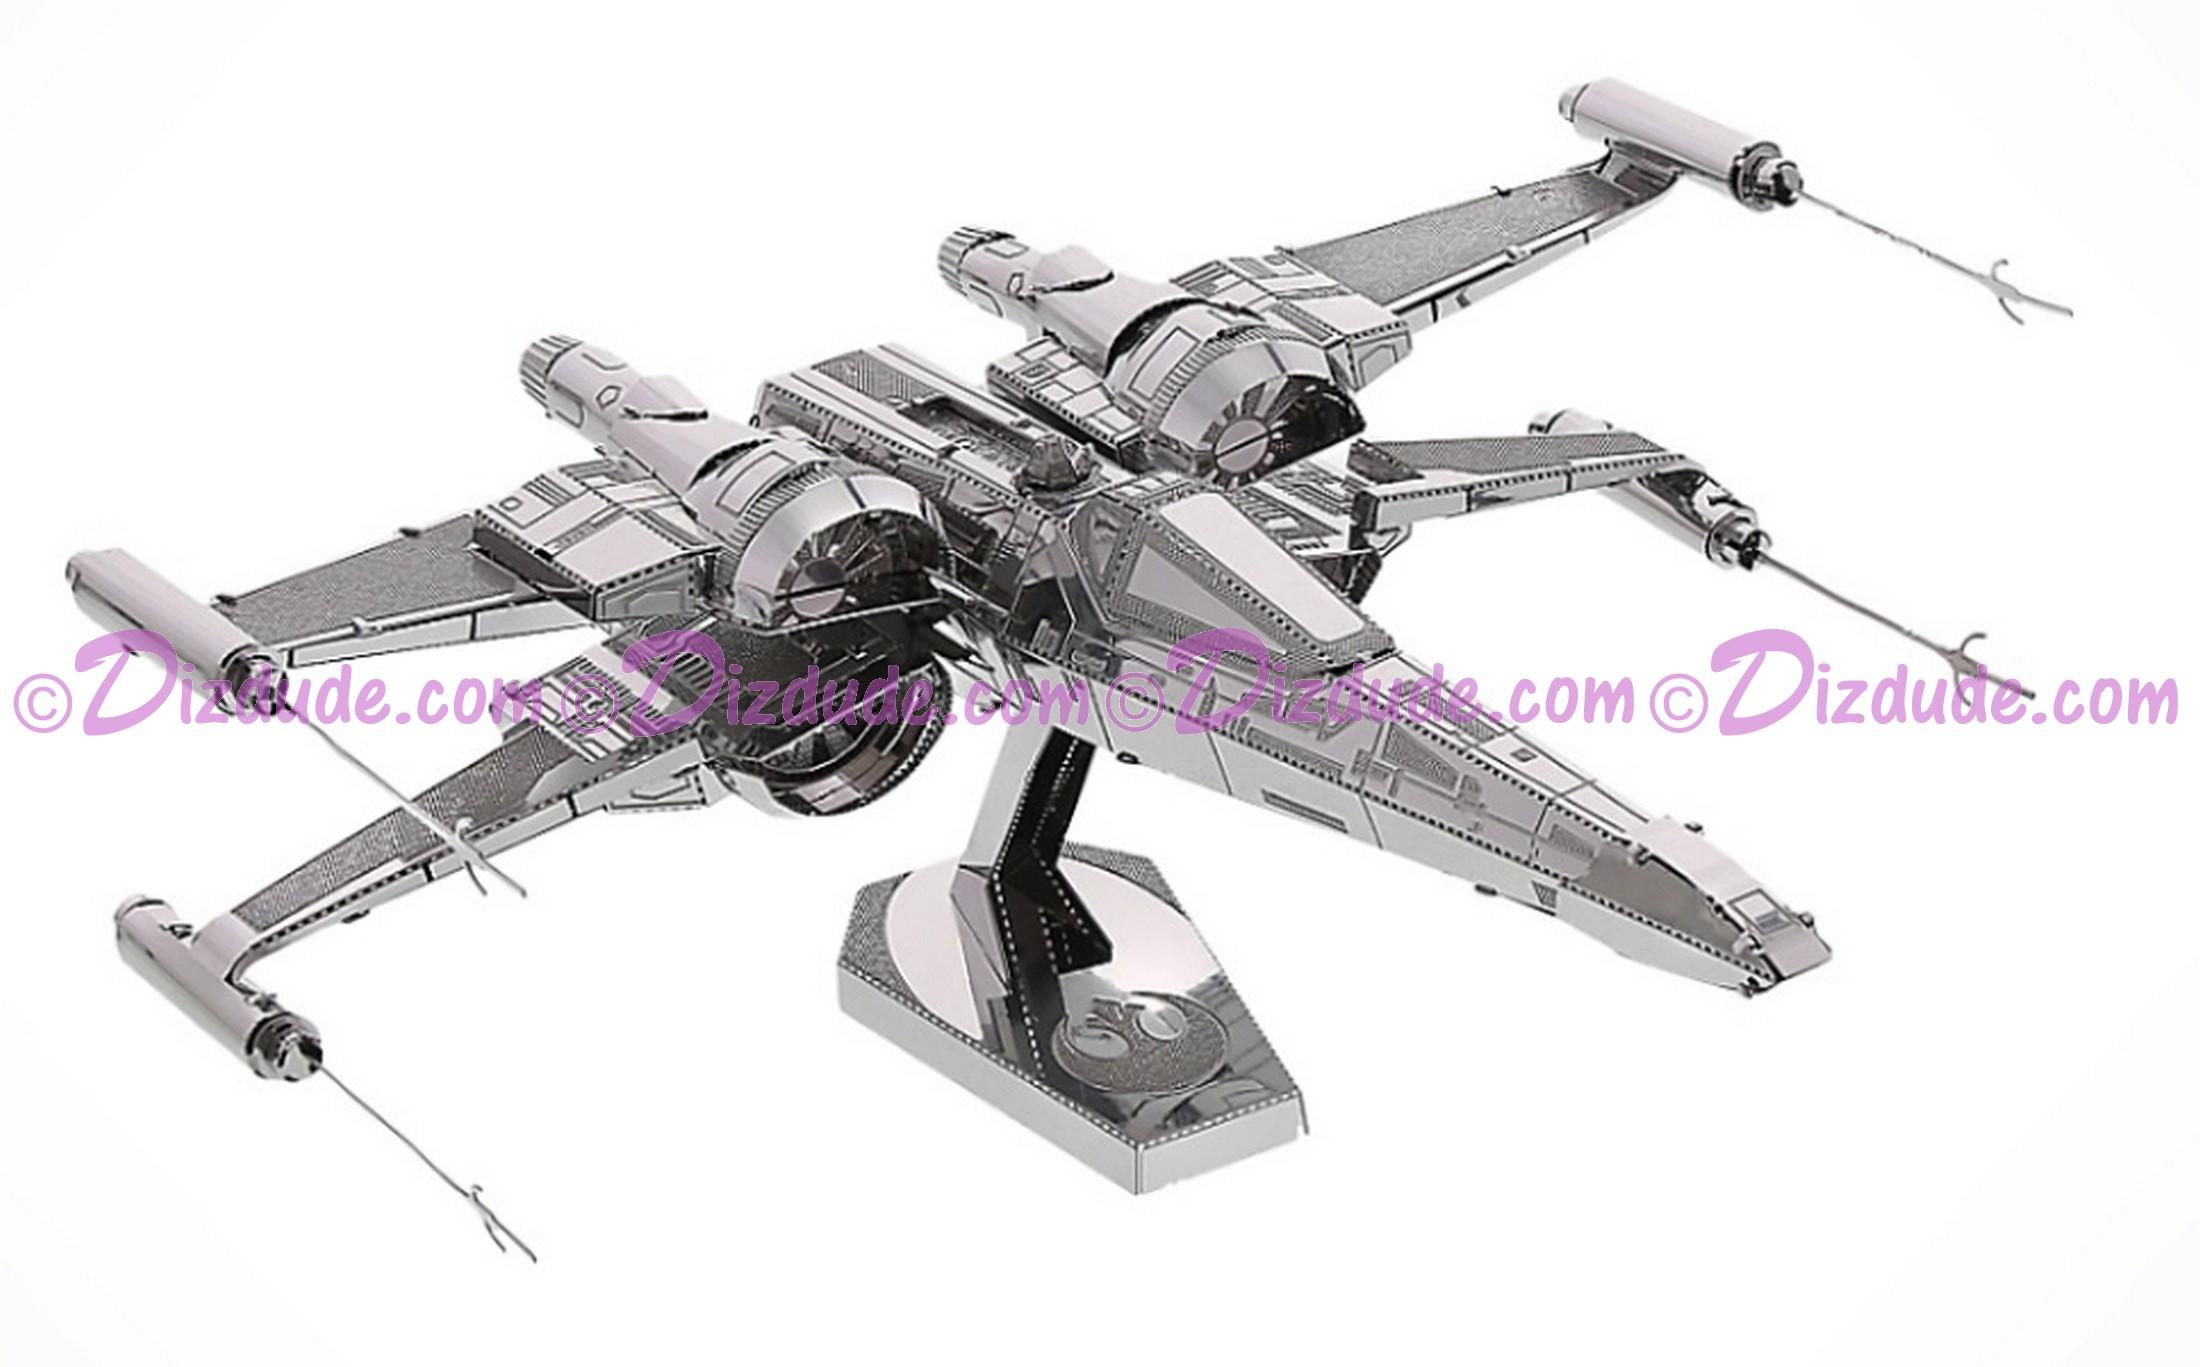 The Force Awakens Poe Dameron's X-Wing Fighter 3D Metal Model Kit ~ Disney Star Wars © Dizdude.com